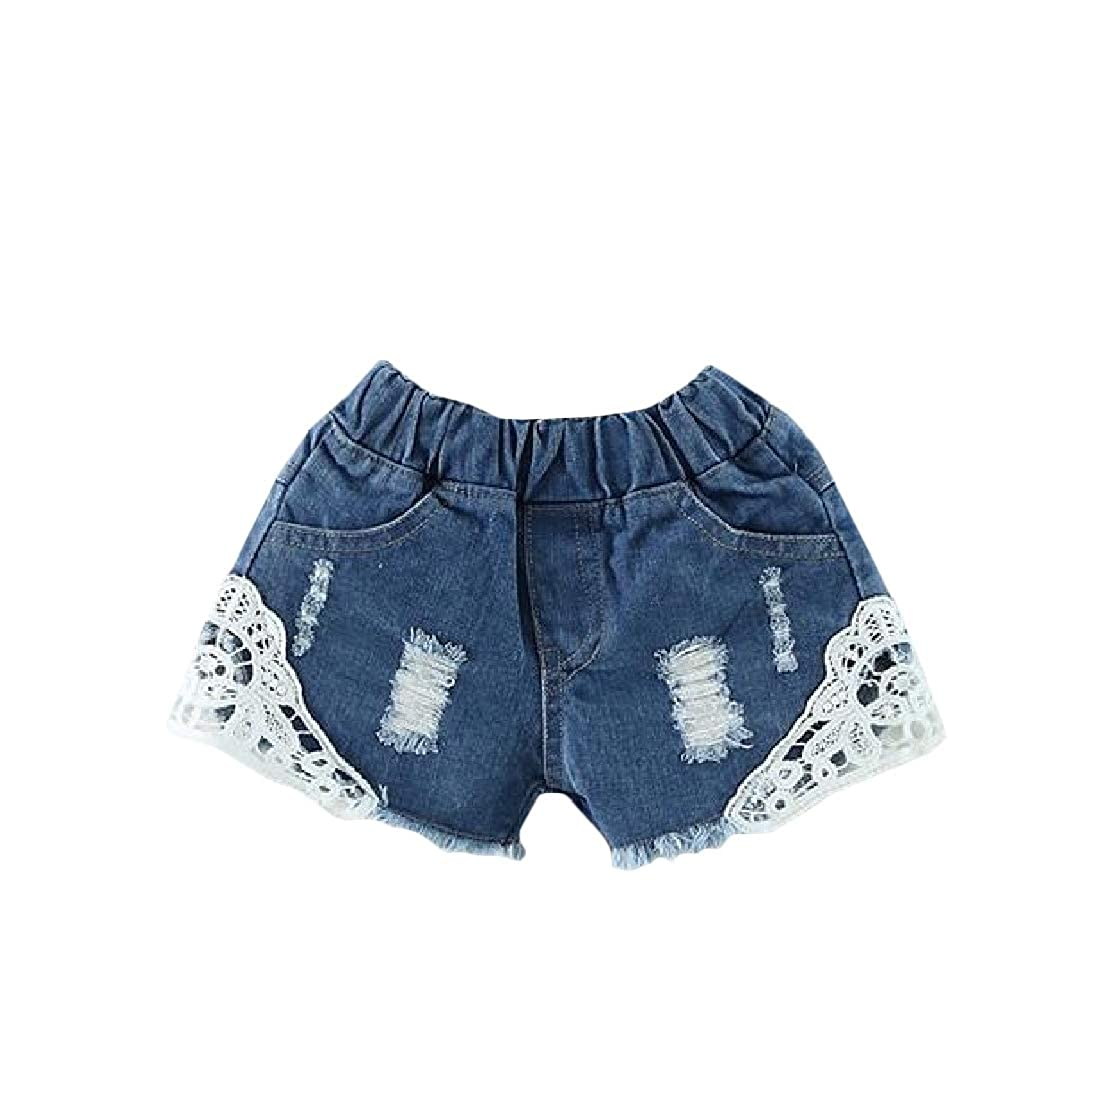 Wofupowga Girls Casual Cute Ripped Cut Off Denim Lace Jean Short